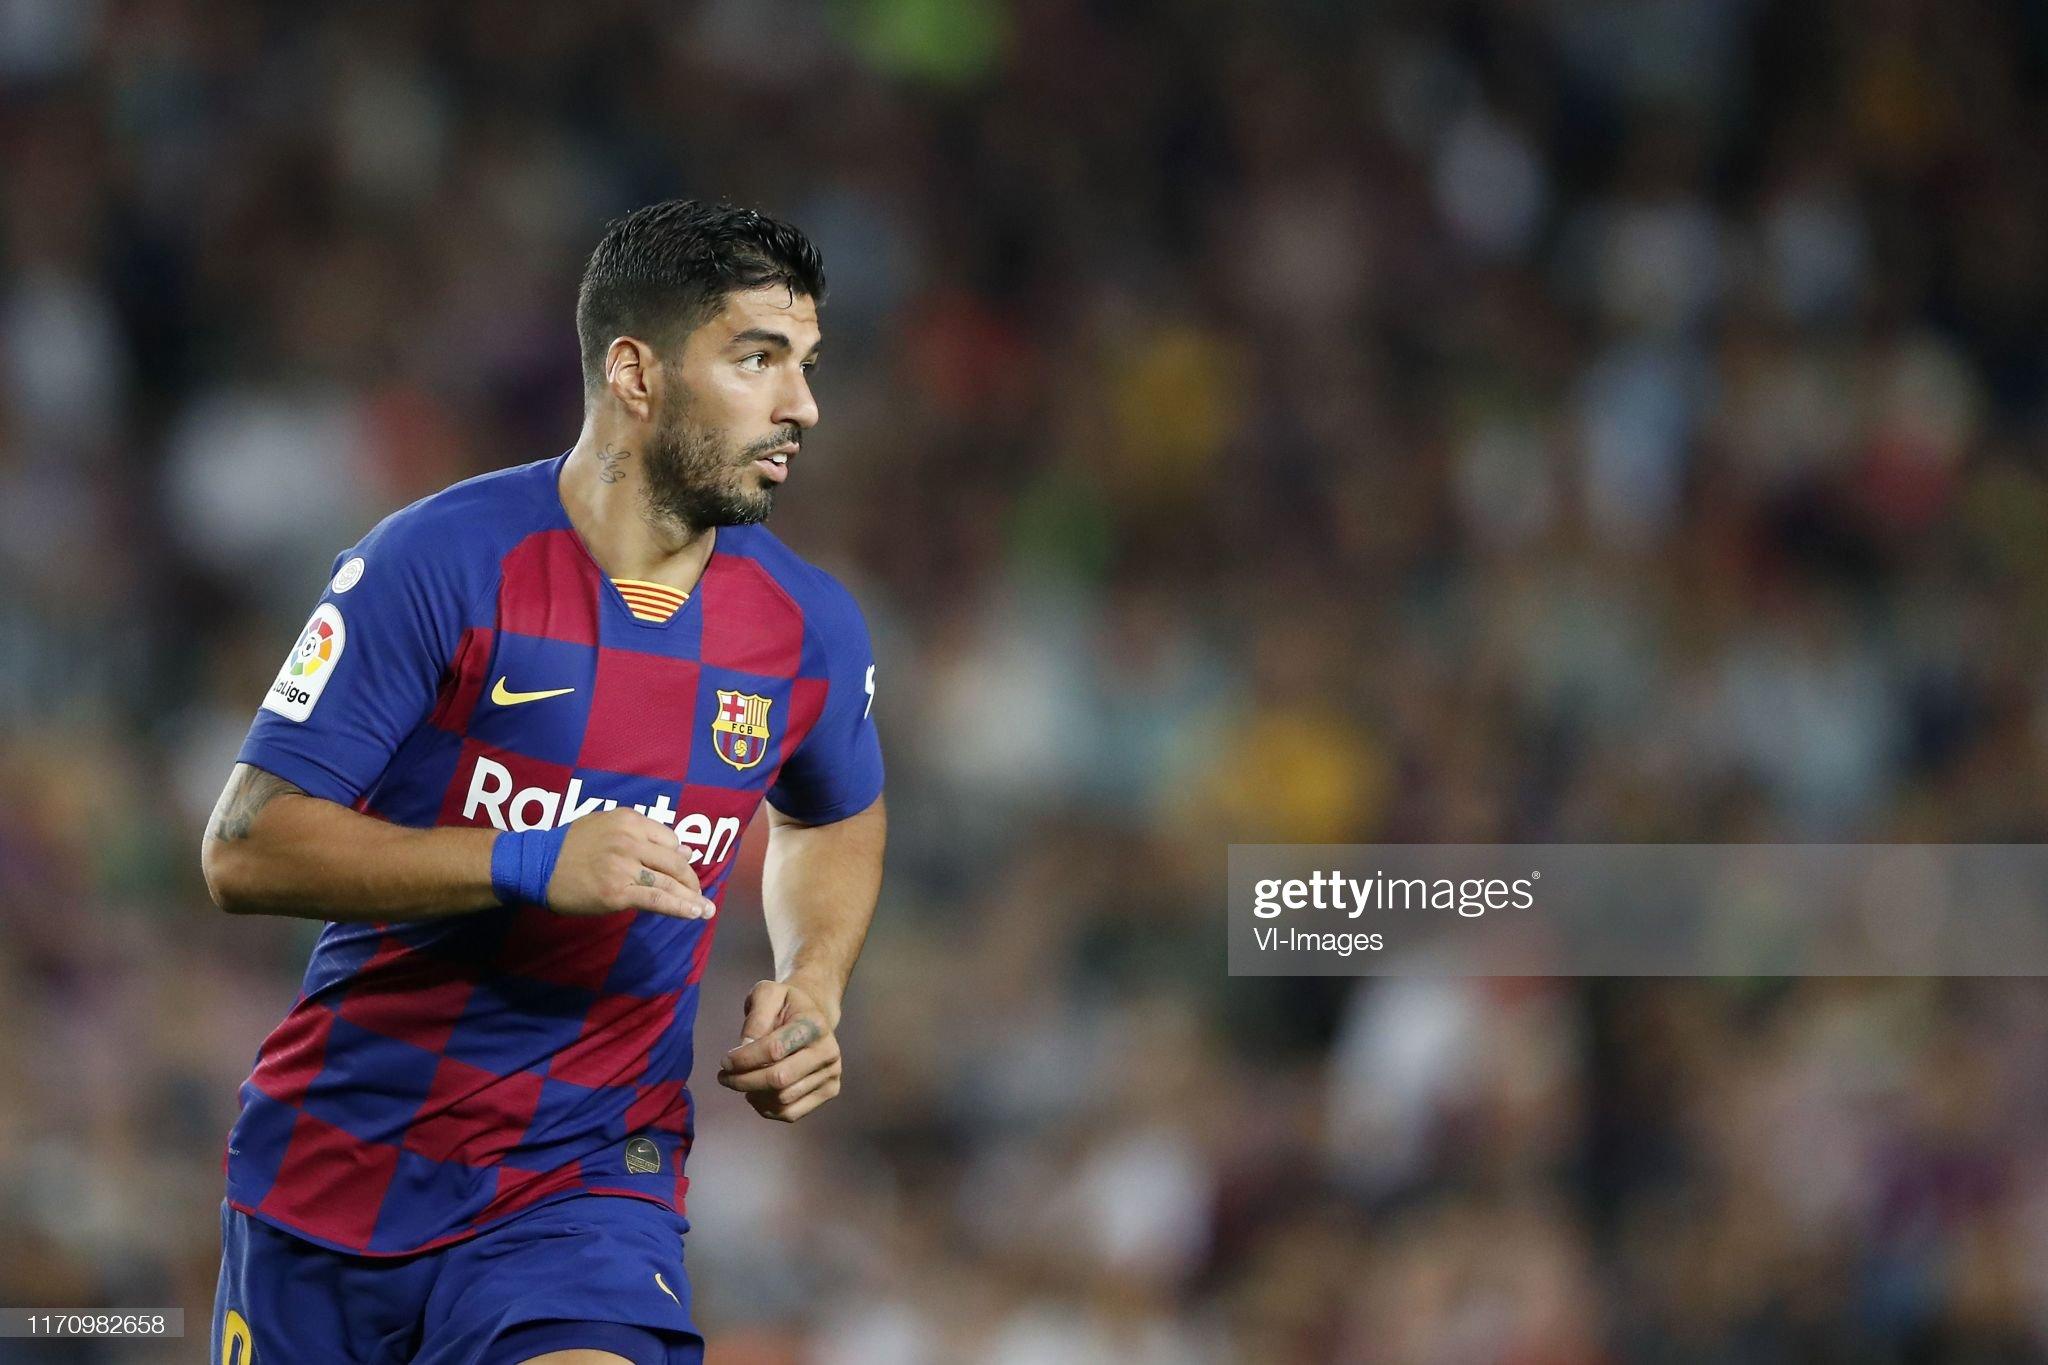 صور مباراة : برشلونة - فياريال 2-1 ( 24-09-2019 )  Luis-suarez-of-fc-barcelona-during-the-laliga-santander-match-between-picture-id1170982658?s=2048x2048